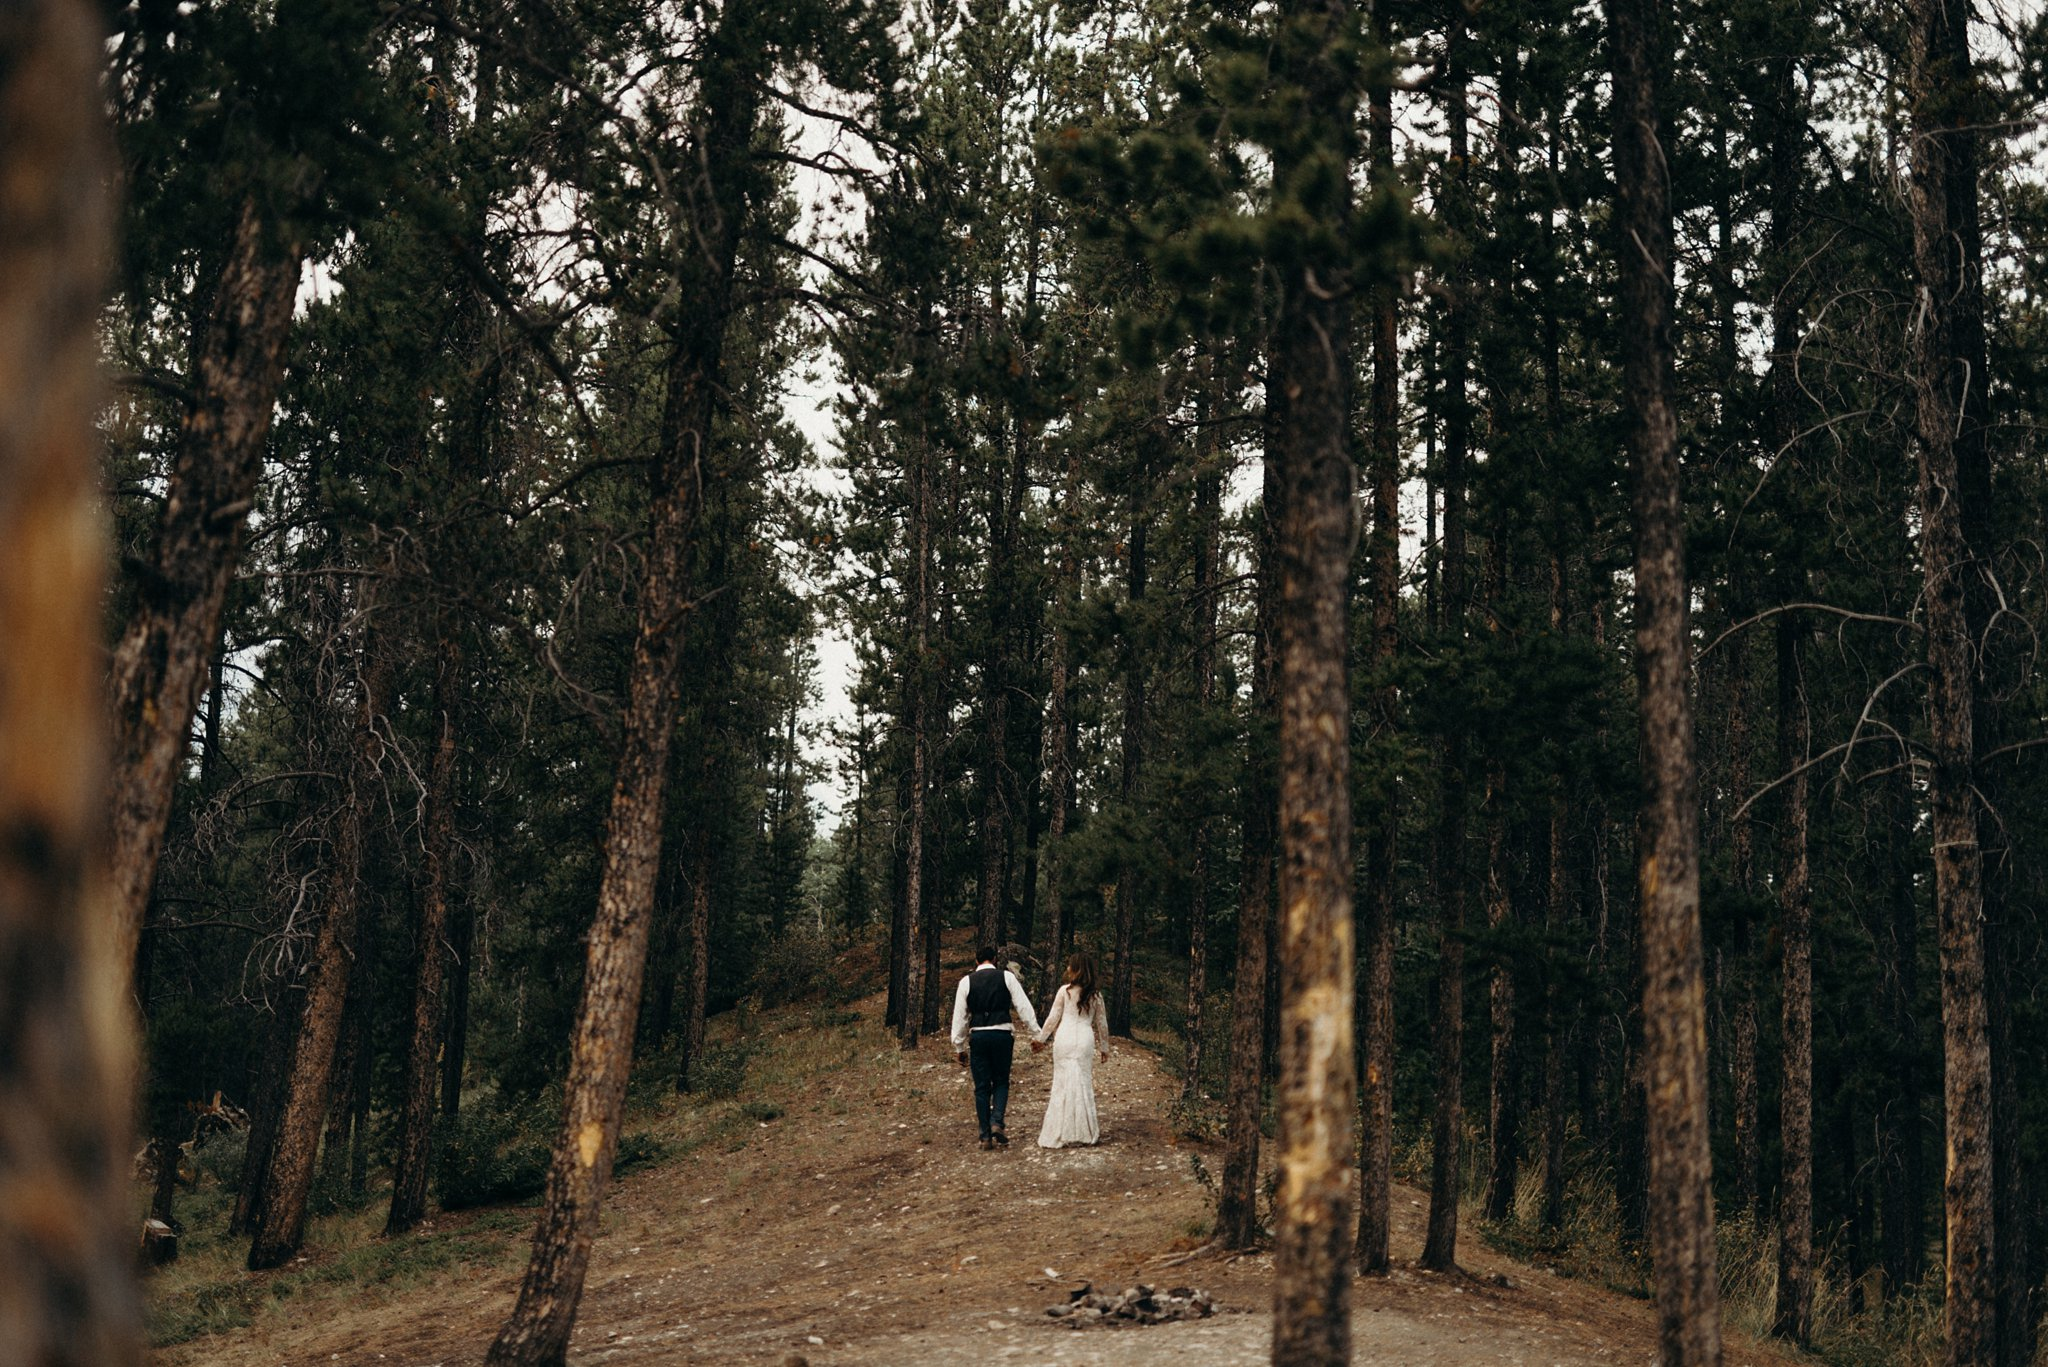 kaihla_tonai_intimate_wedding_elopement_photographer_6739.jpg